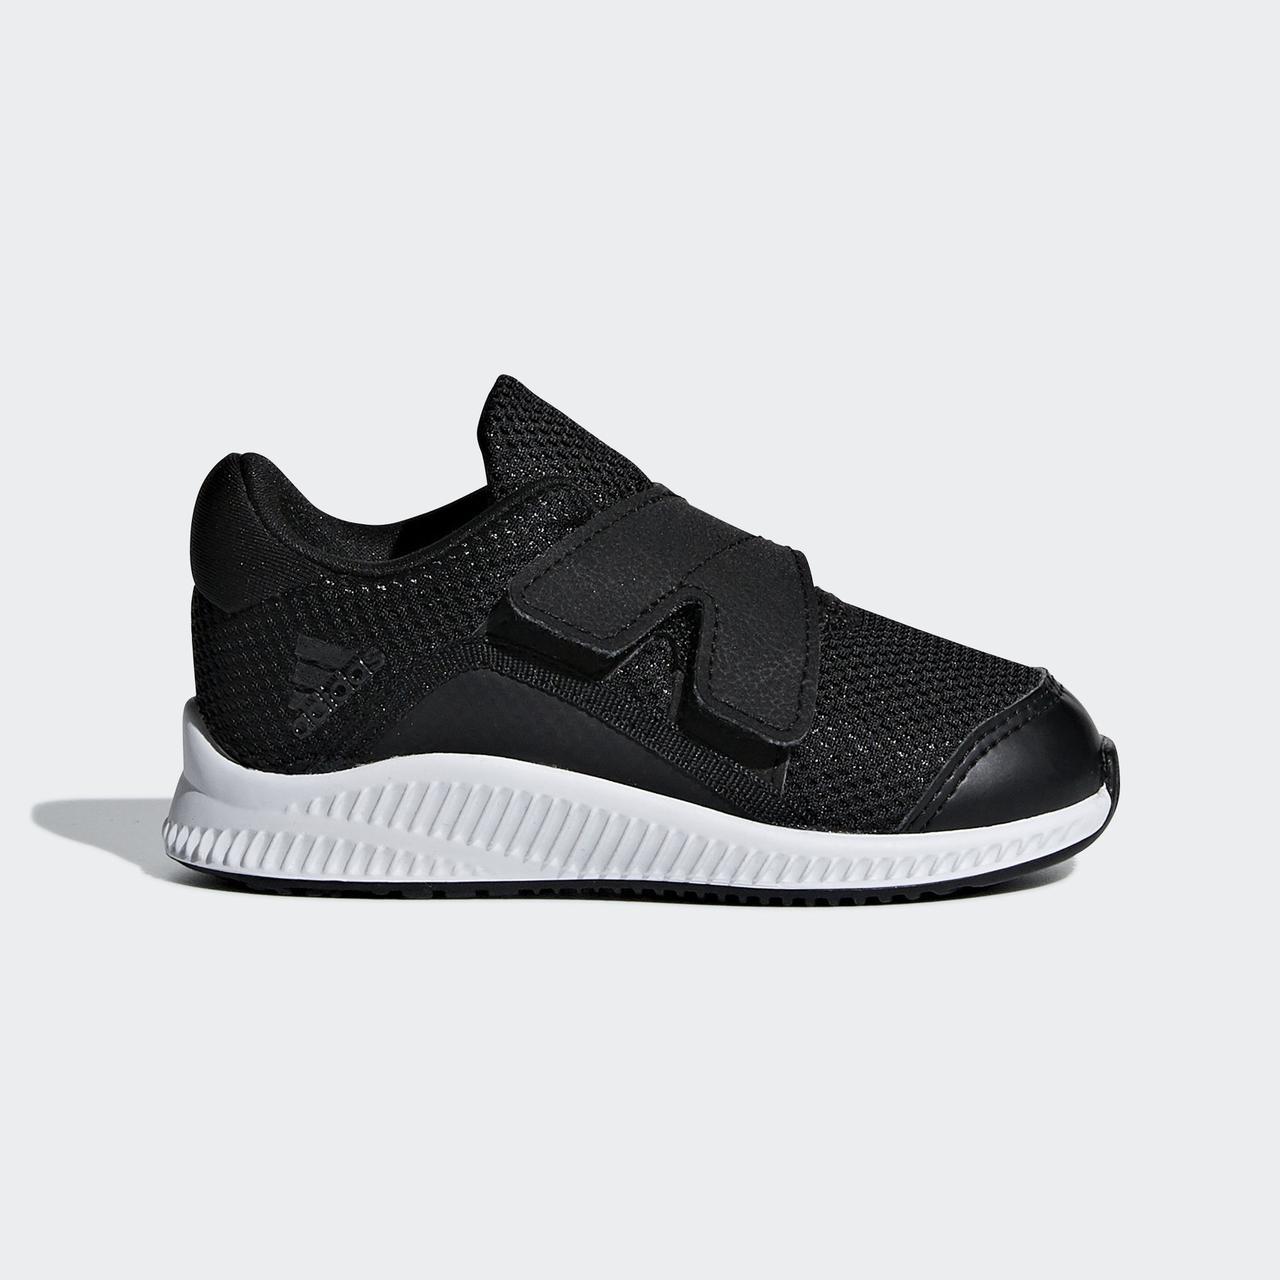 5d559715 Детские кроссовки Adidas Performance Fortarun X (Артикул: B96231) -  Интернет-магазин «